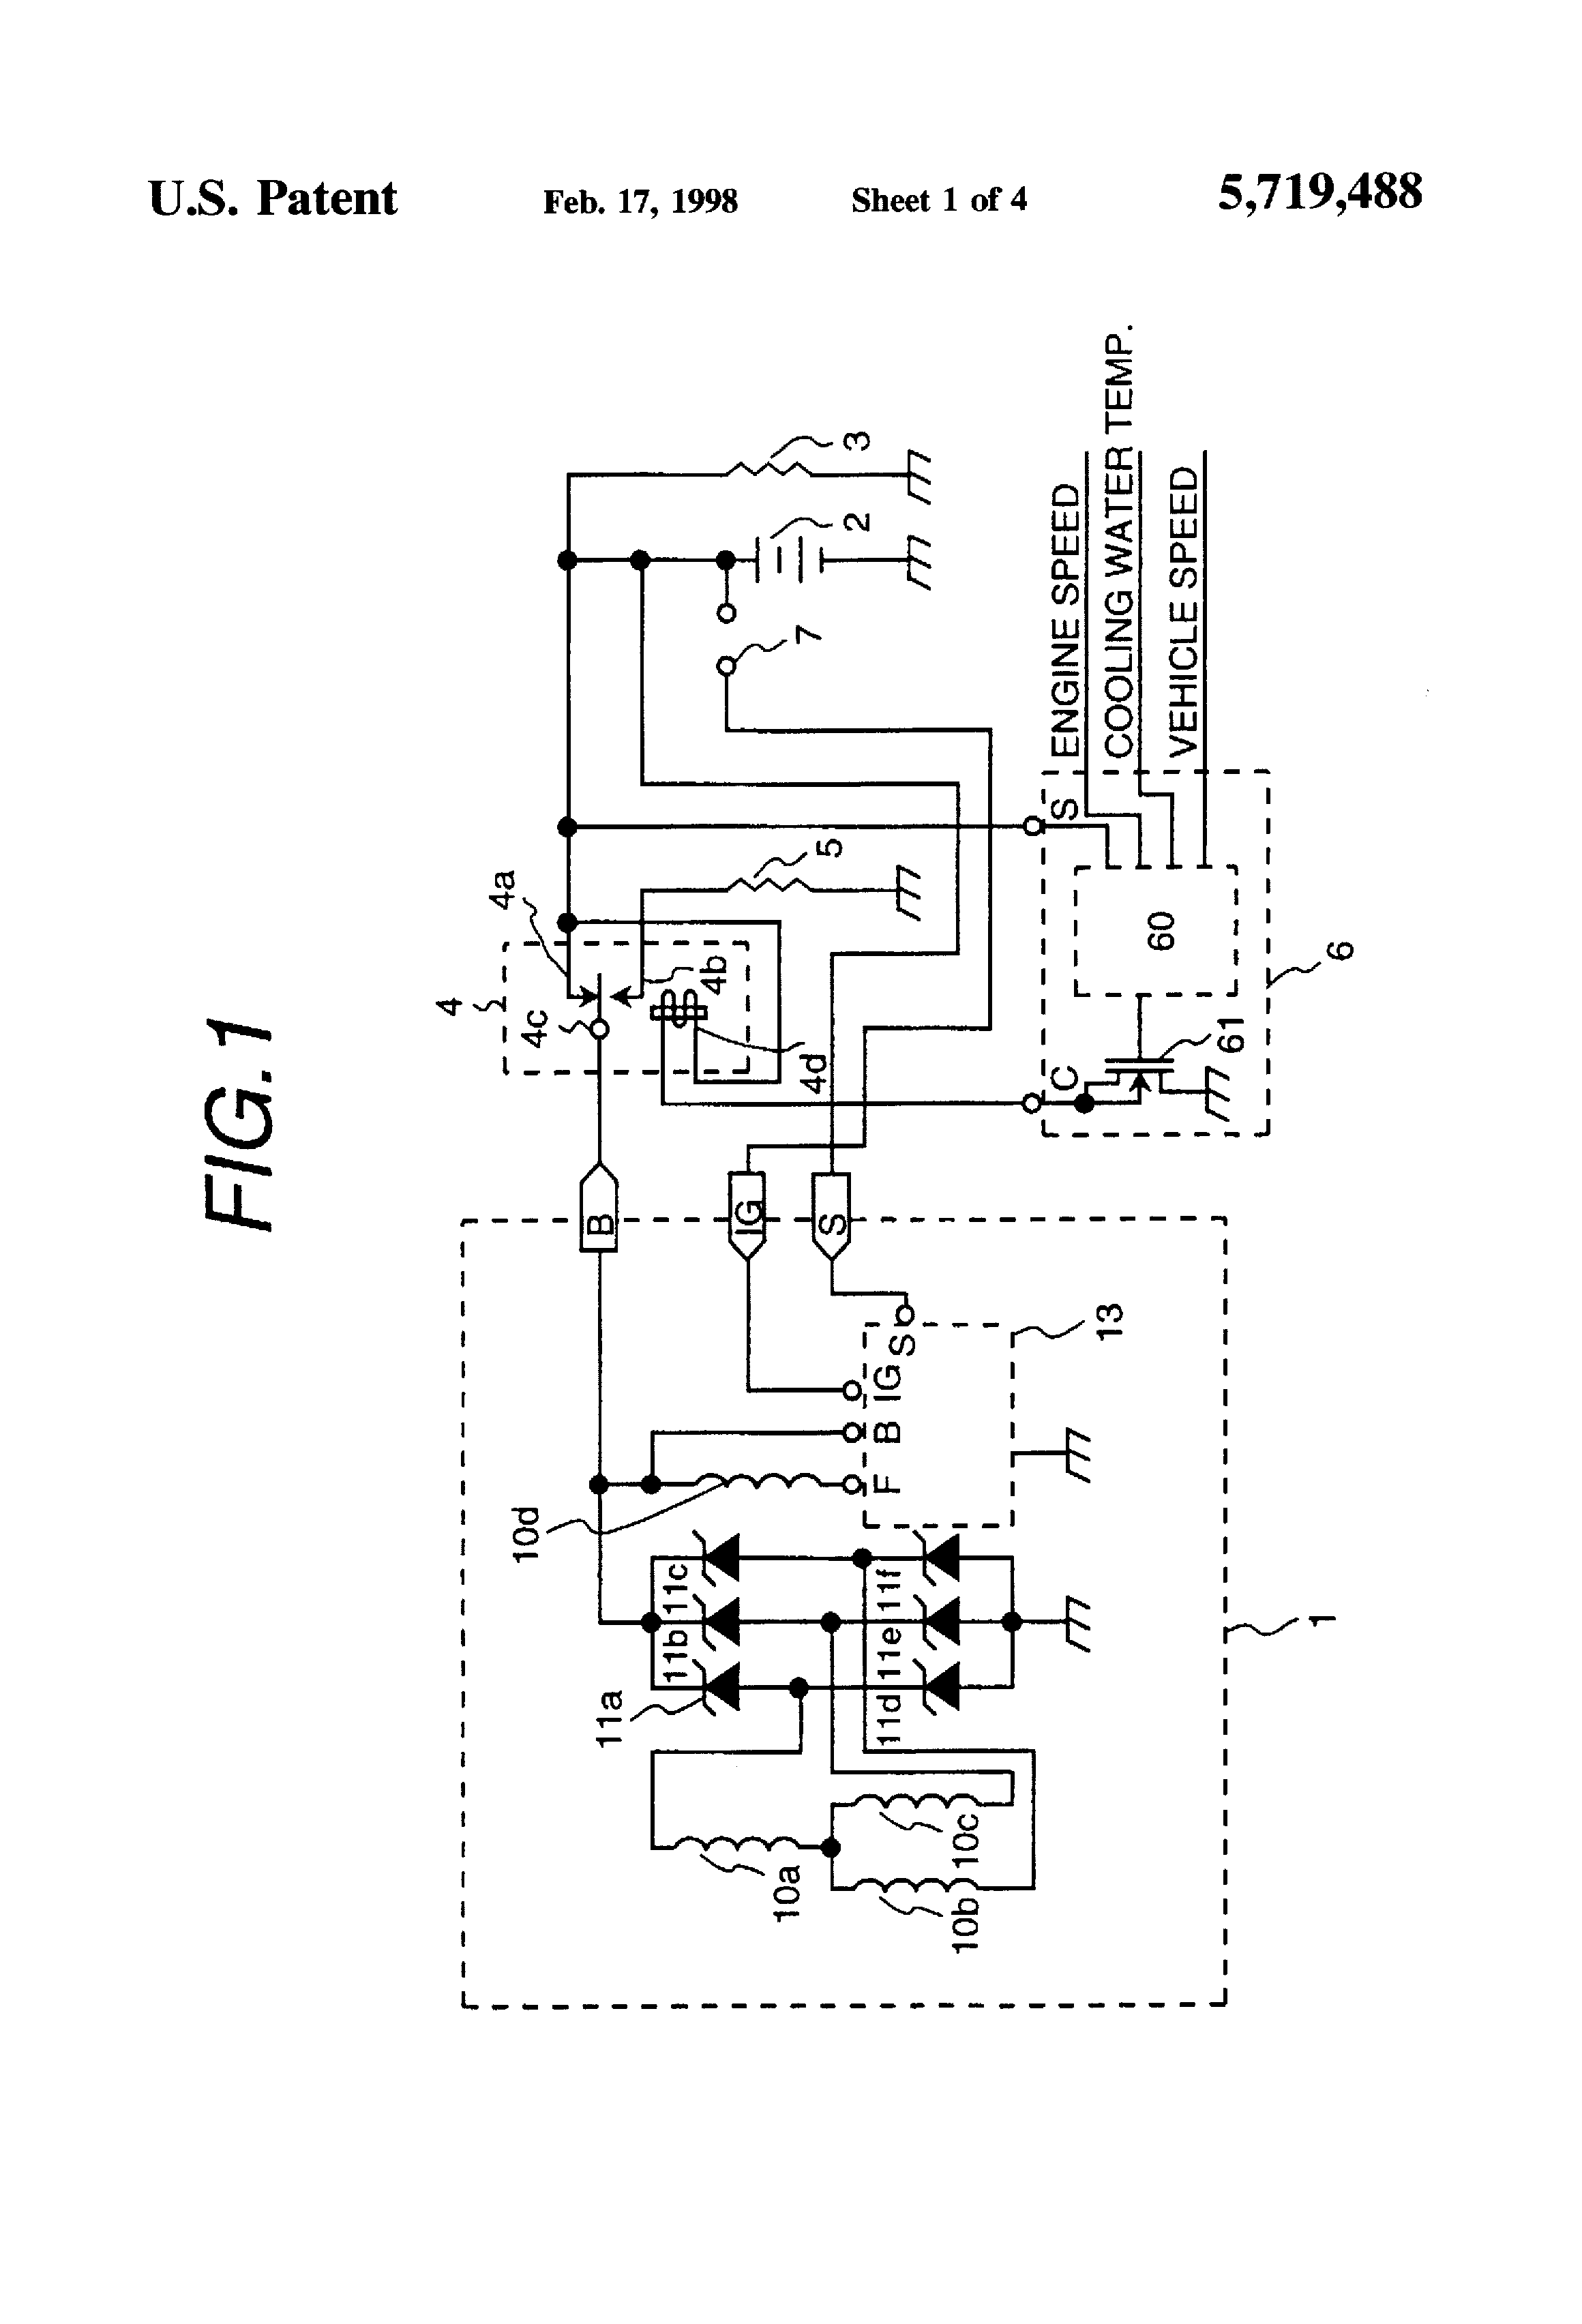 Kc Hilites C2 Ae 6310 Roof Mount Wiring Harness Diagram Generator Google Patents On Voltage Regulator